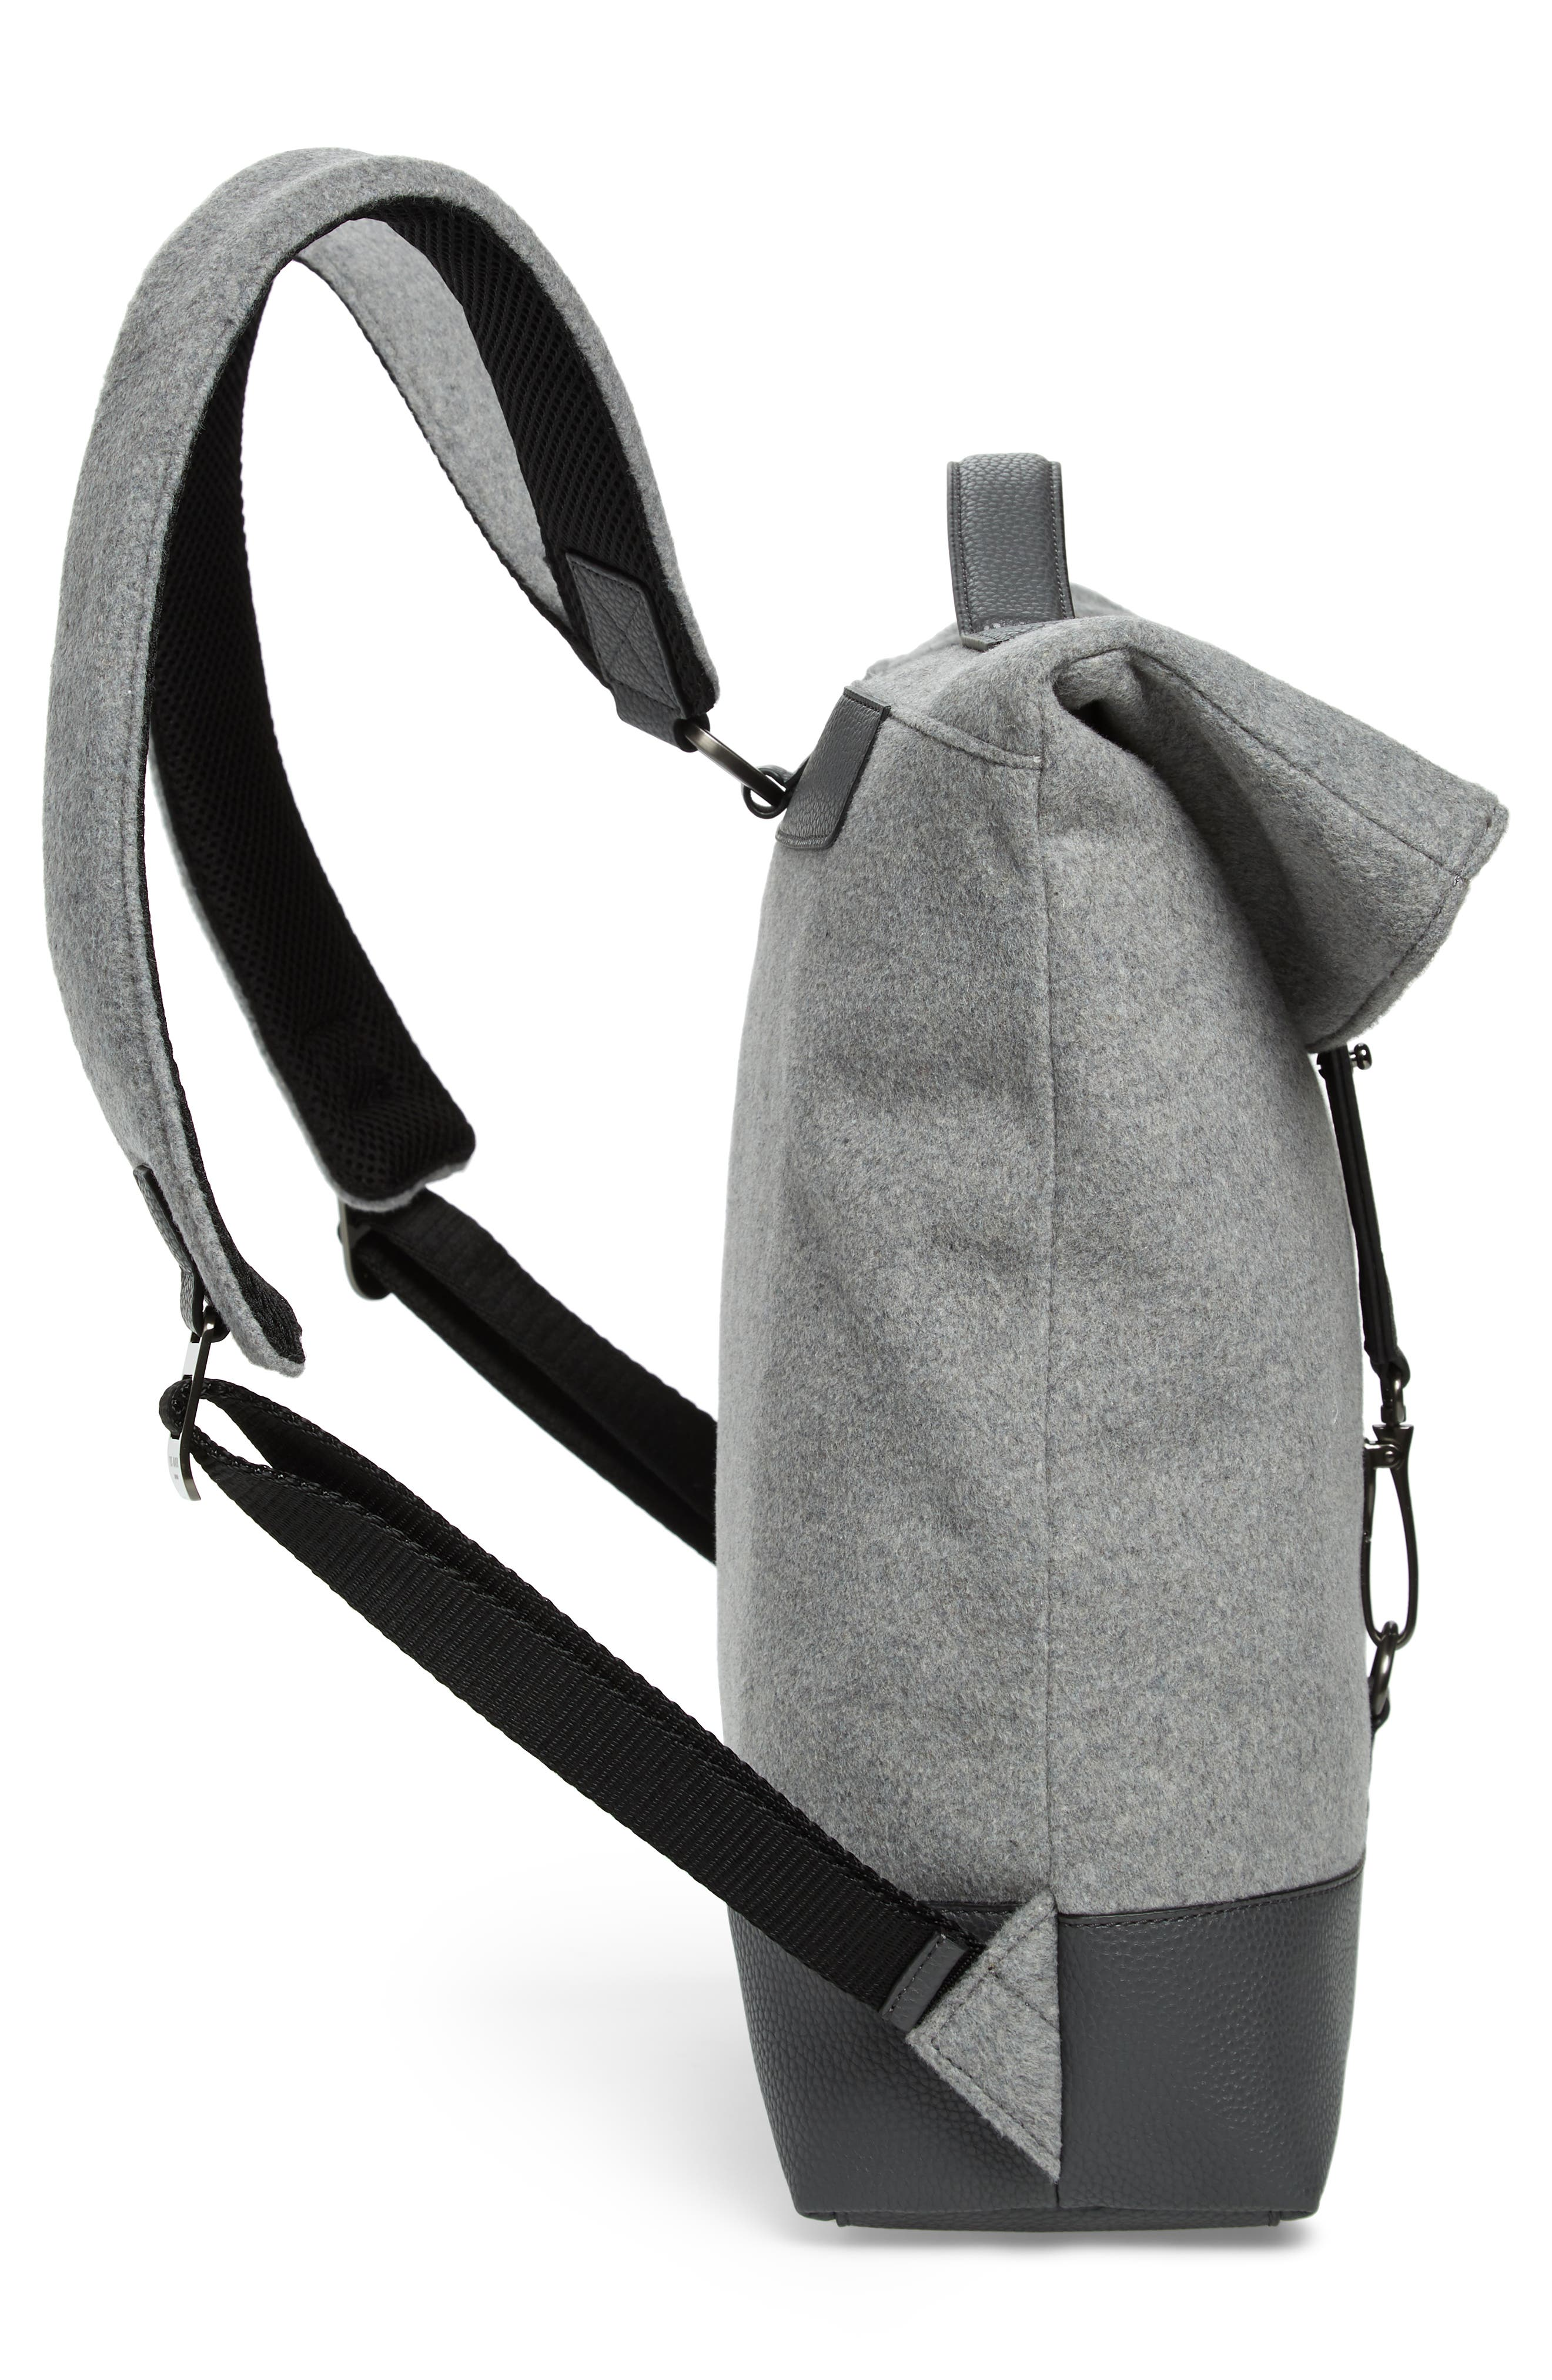 Cashed Backpack,                             Alternate thumbnail 5, color,                             GREY